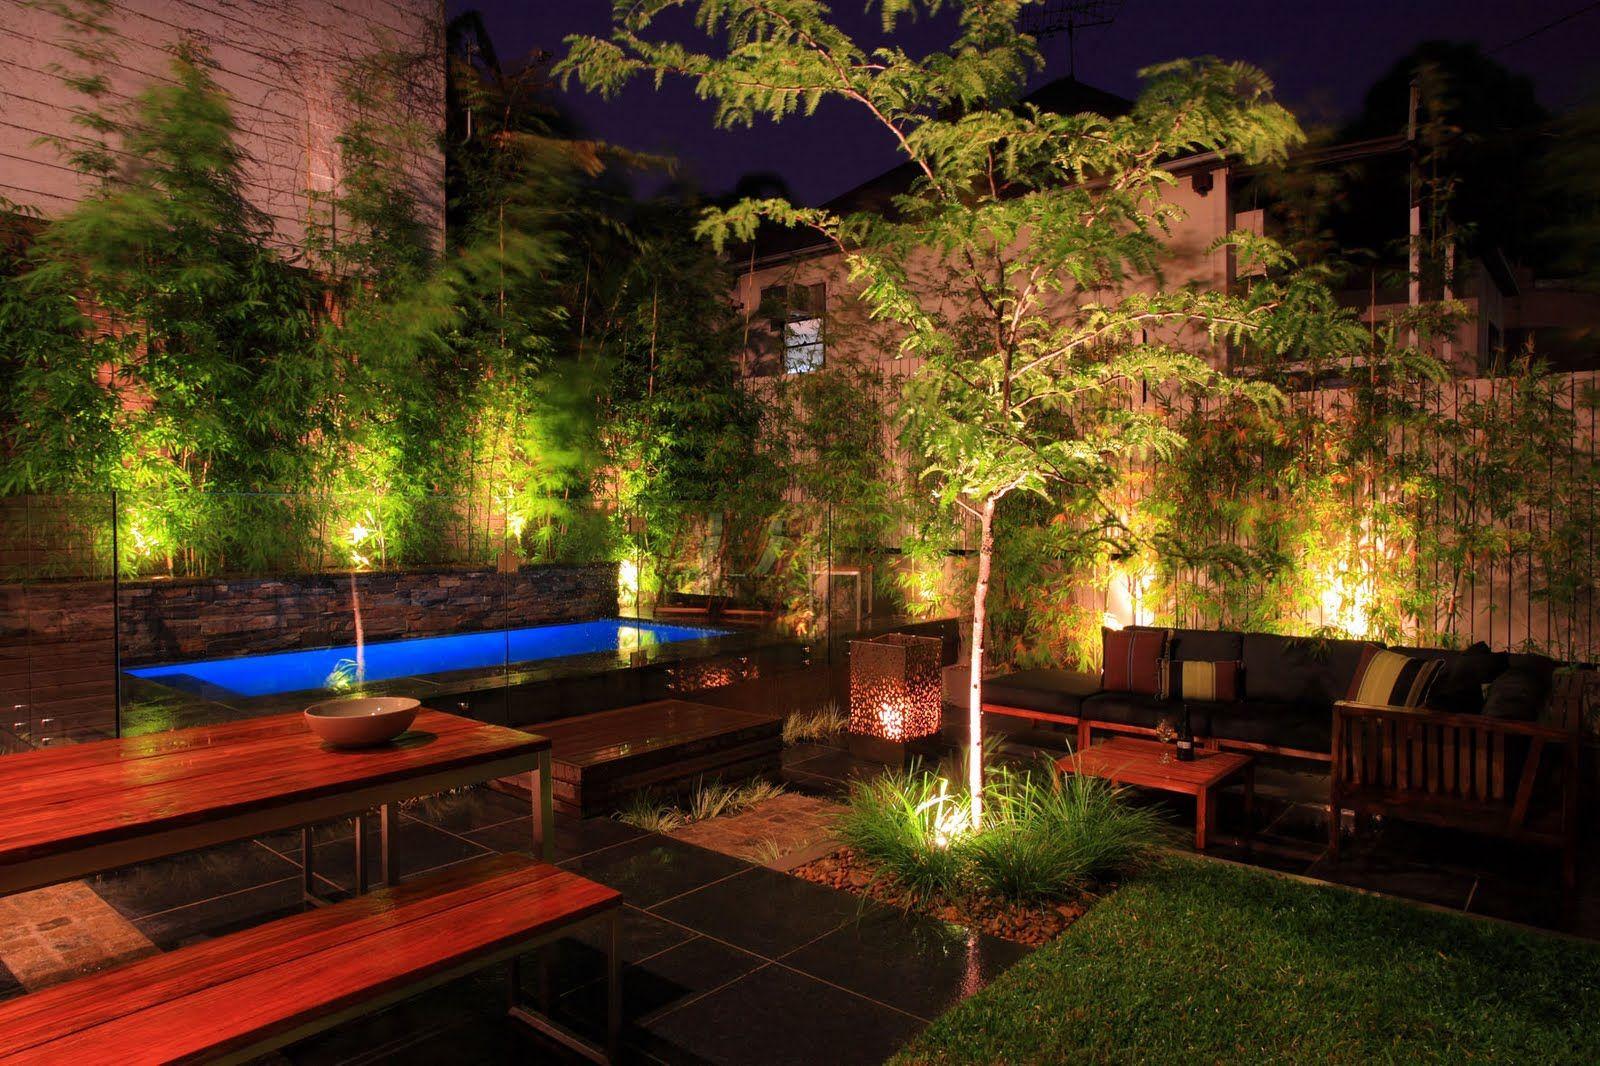 outdoor garden lighting ideas. a beautifully garden area new sensation in with lighting ideas outdoor inspiration